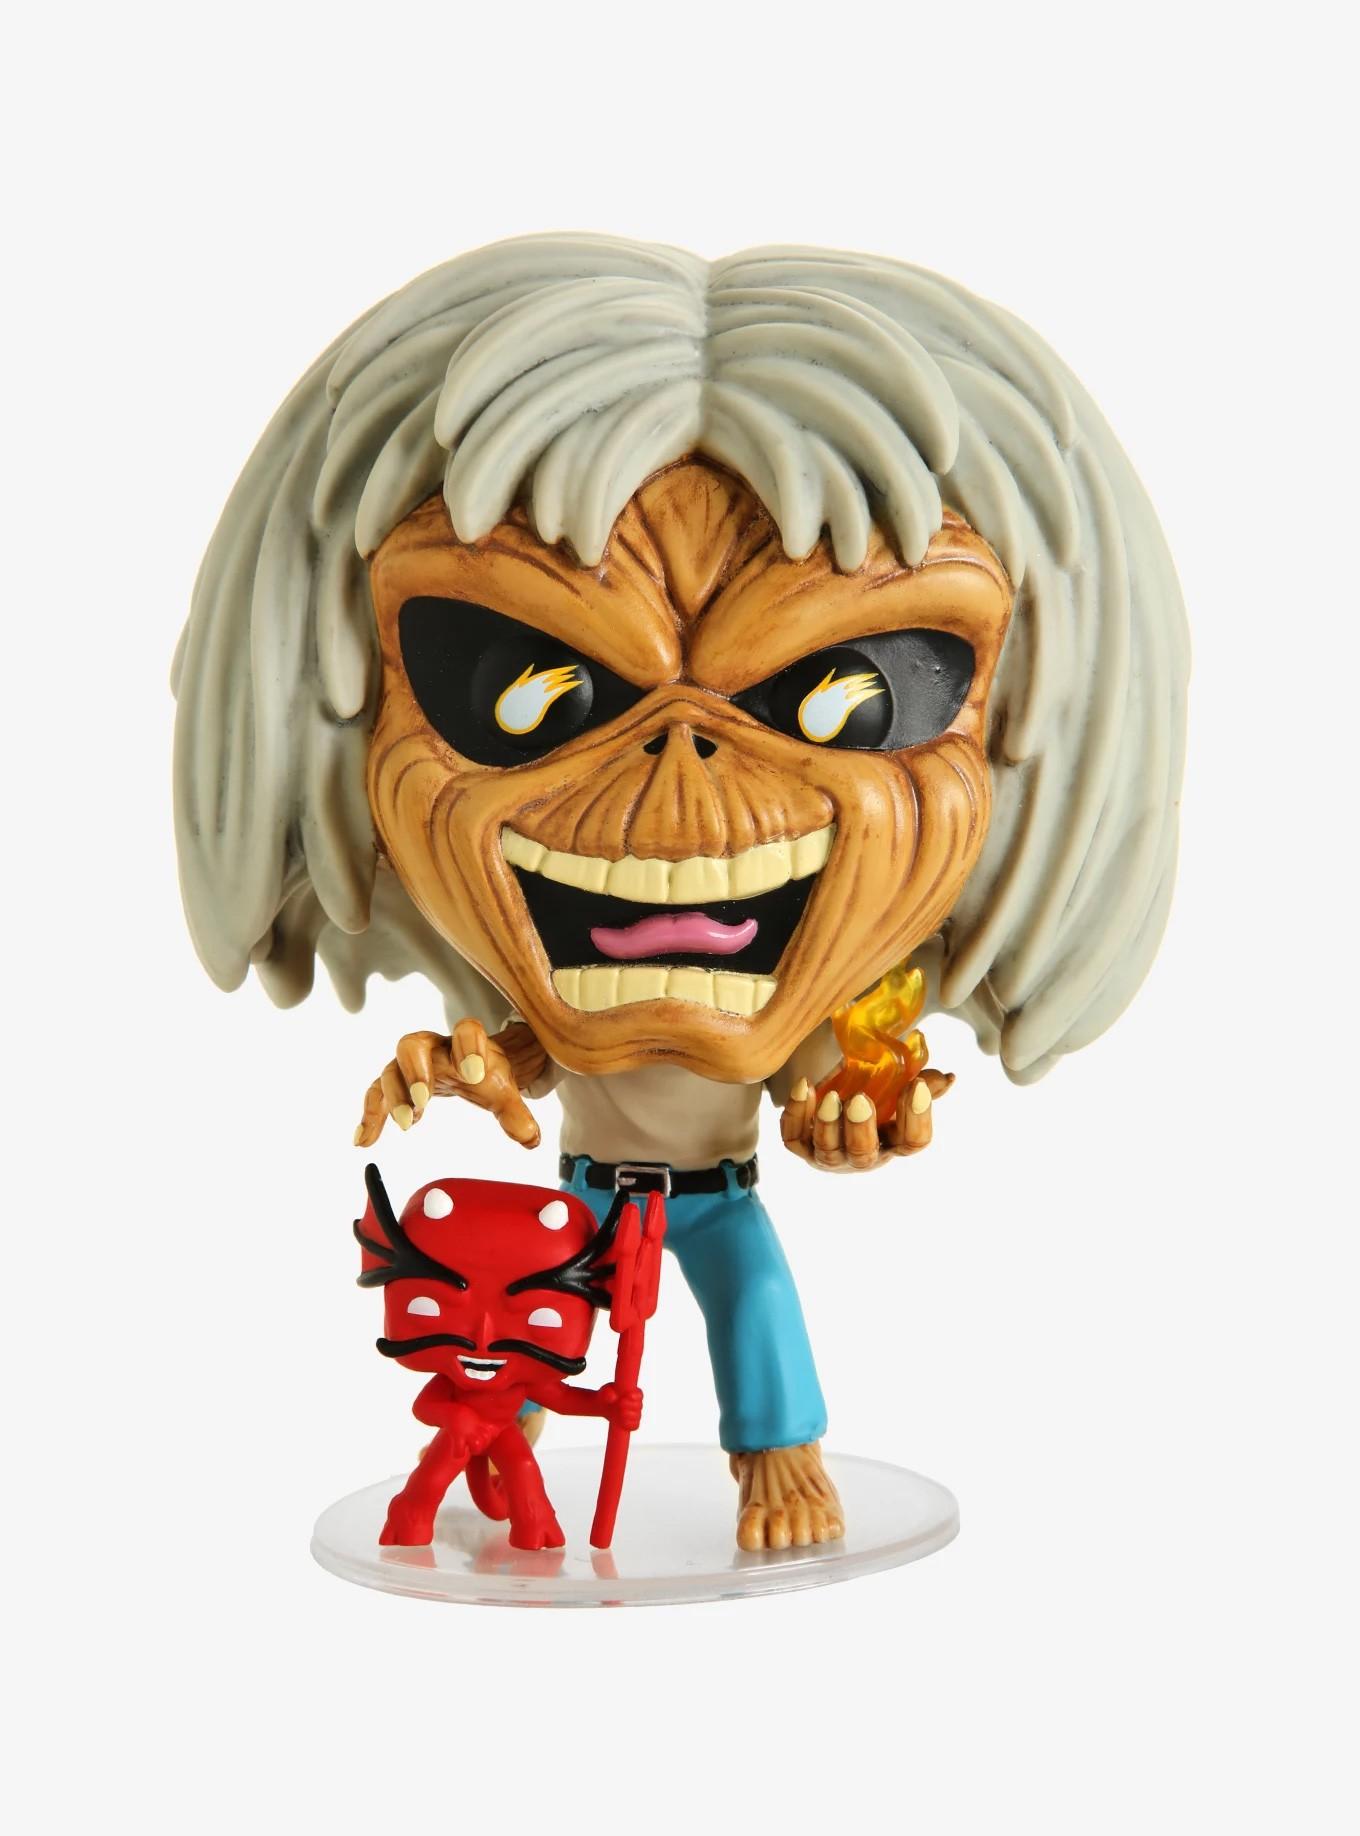 The Number of The Beast Eddie #145 - Iron Maiden - Funko Pop! Rocks